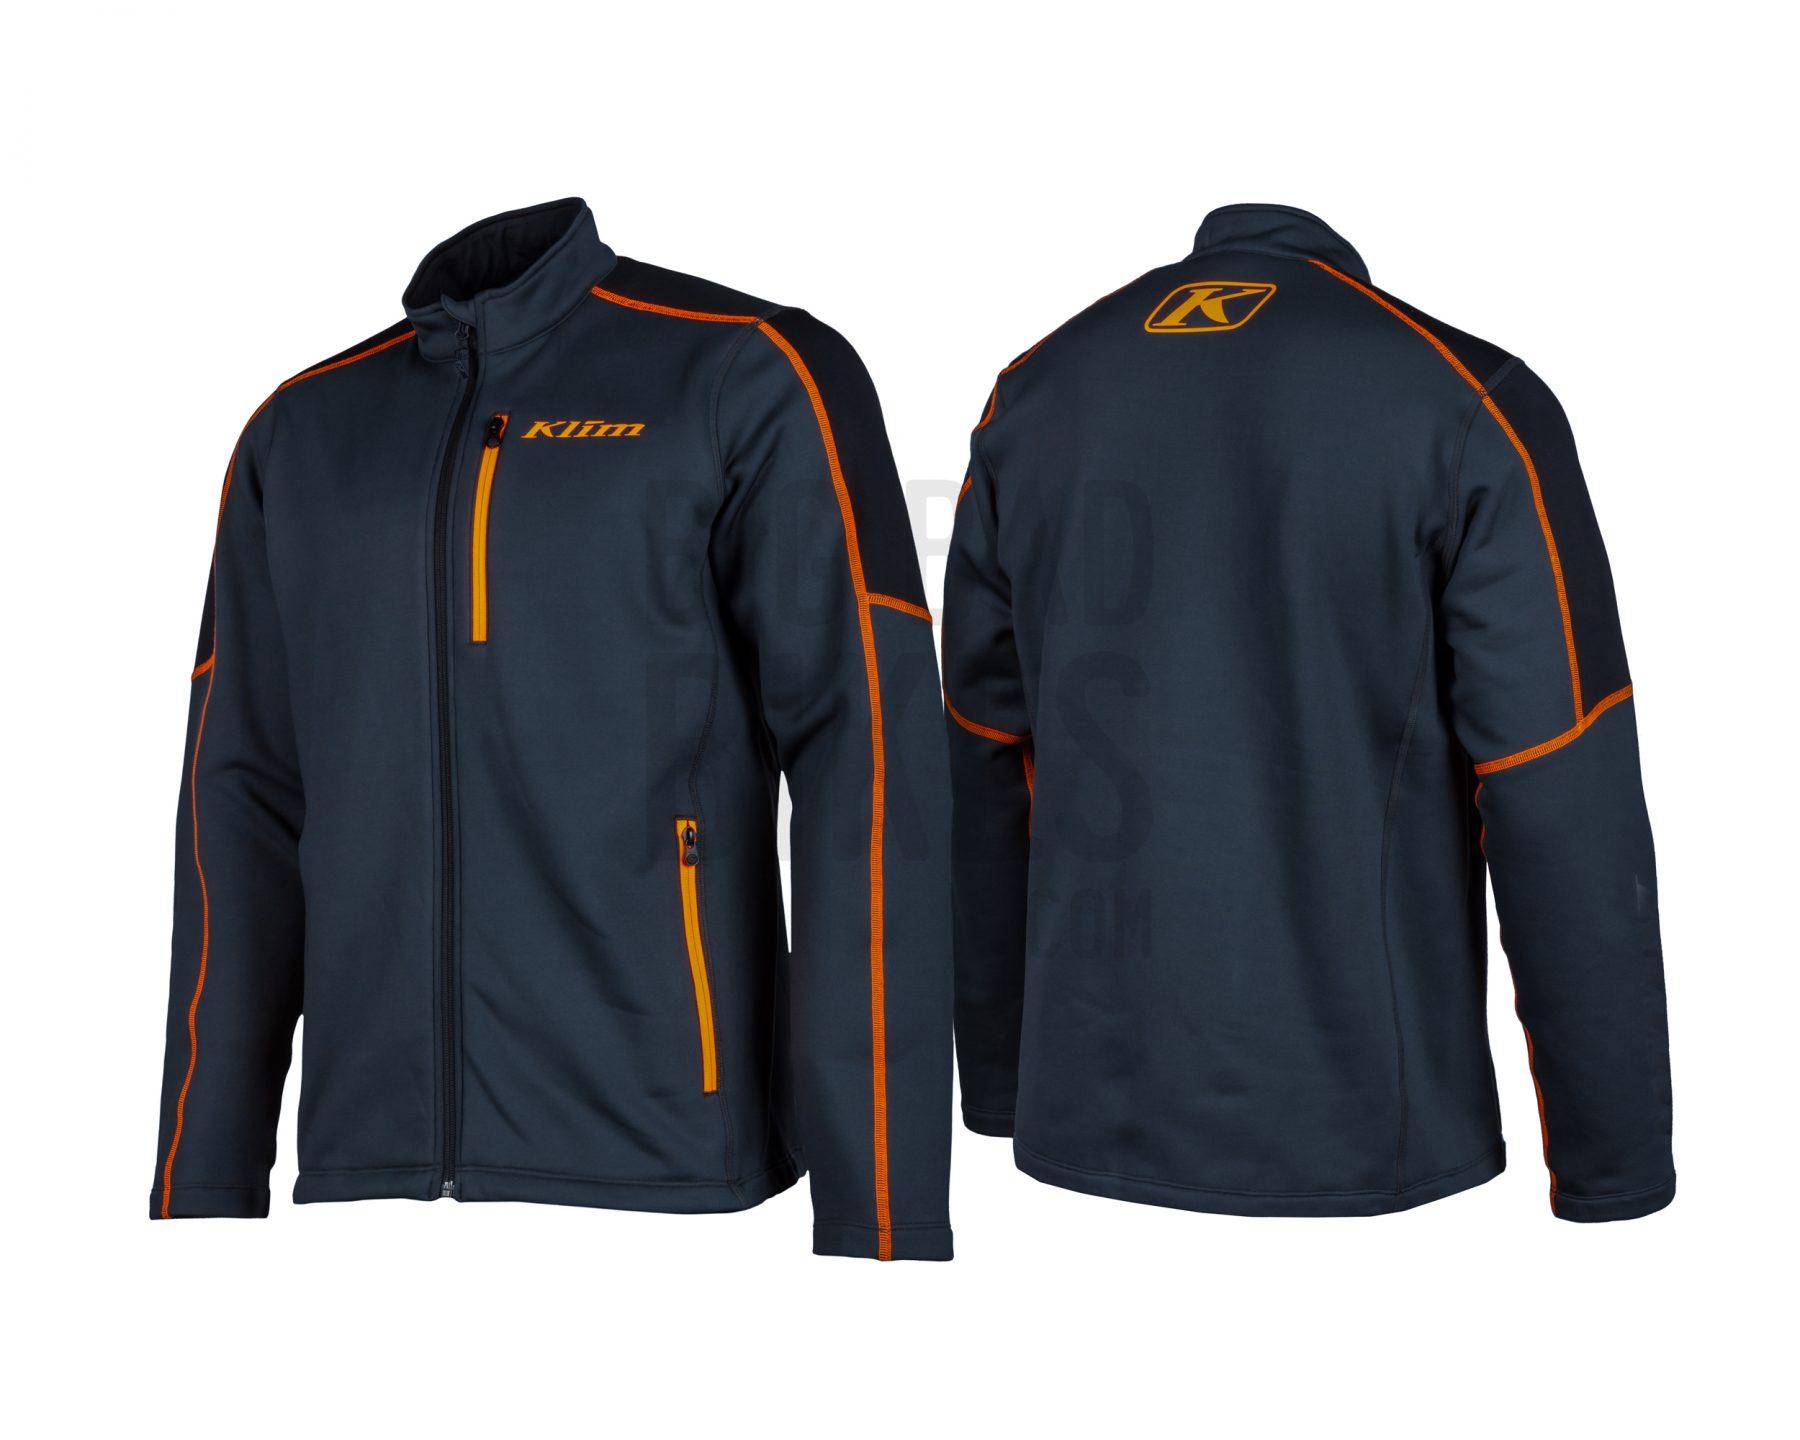 3354-006_Asphalt - Strike Orange_Secondary_01